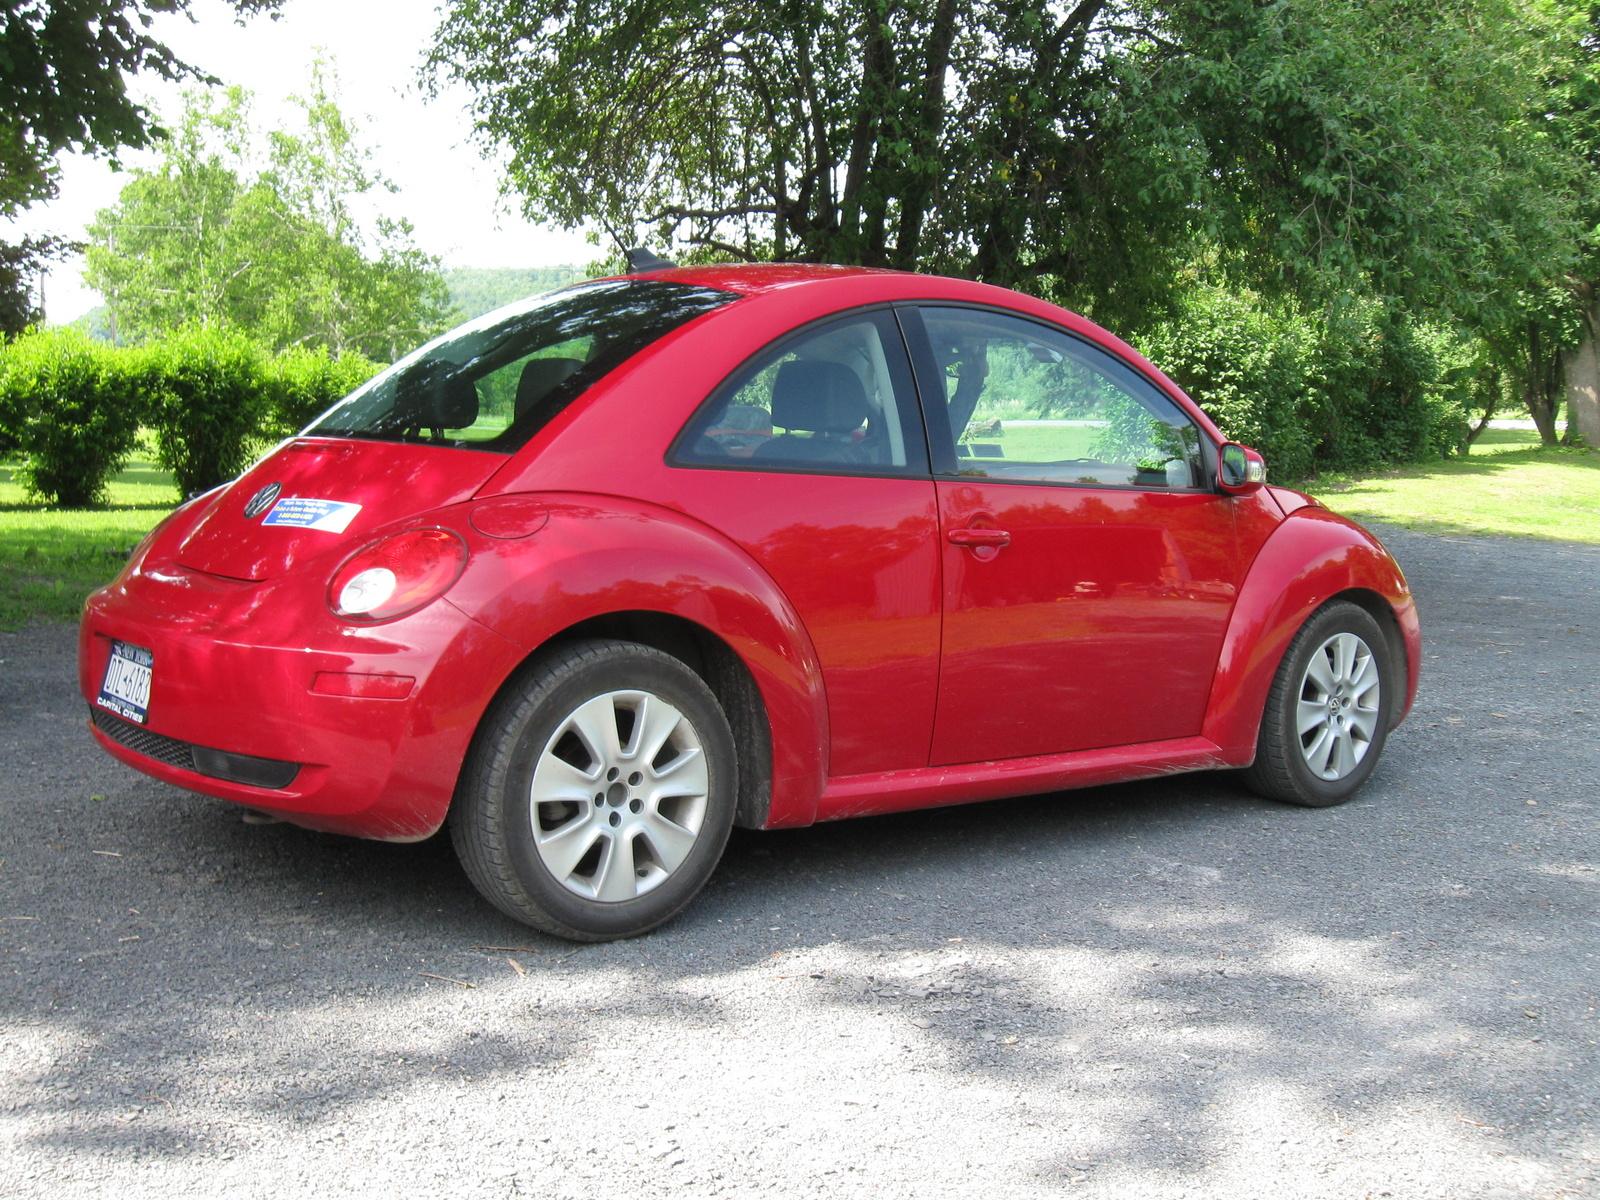 Picture of 2010 Volkswagen Beetle 2.5L PZEV, exterior